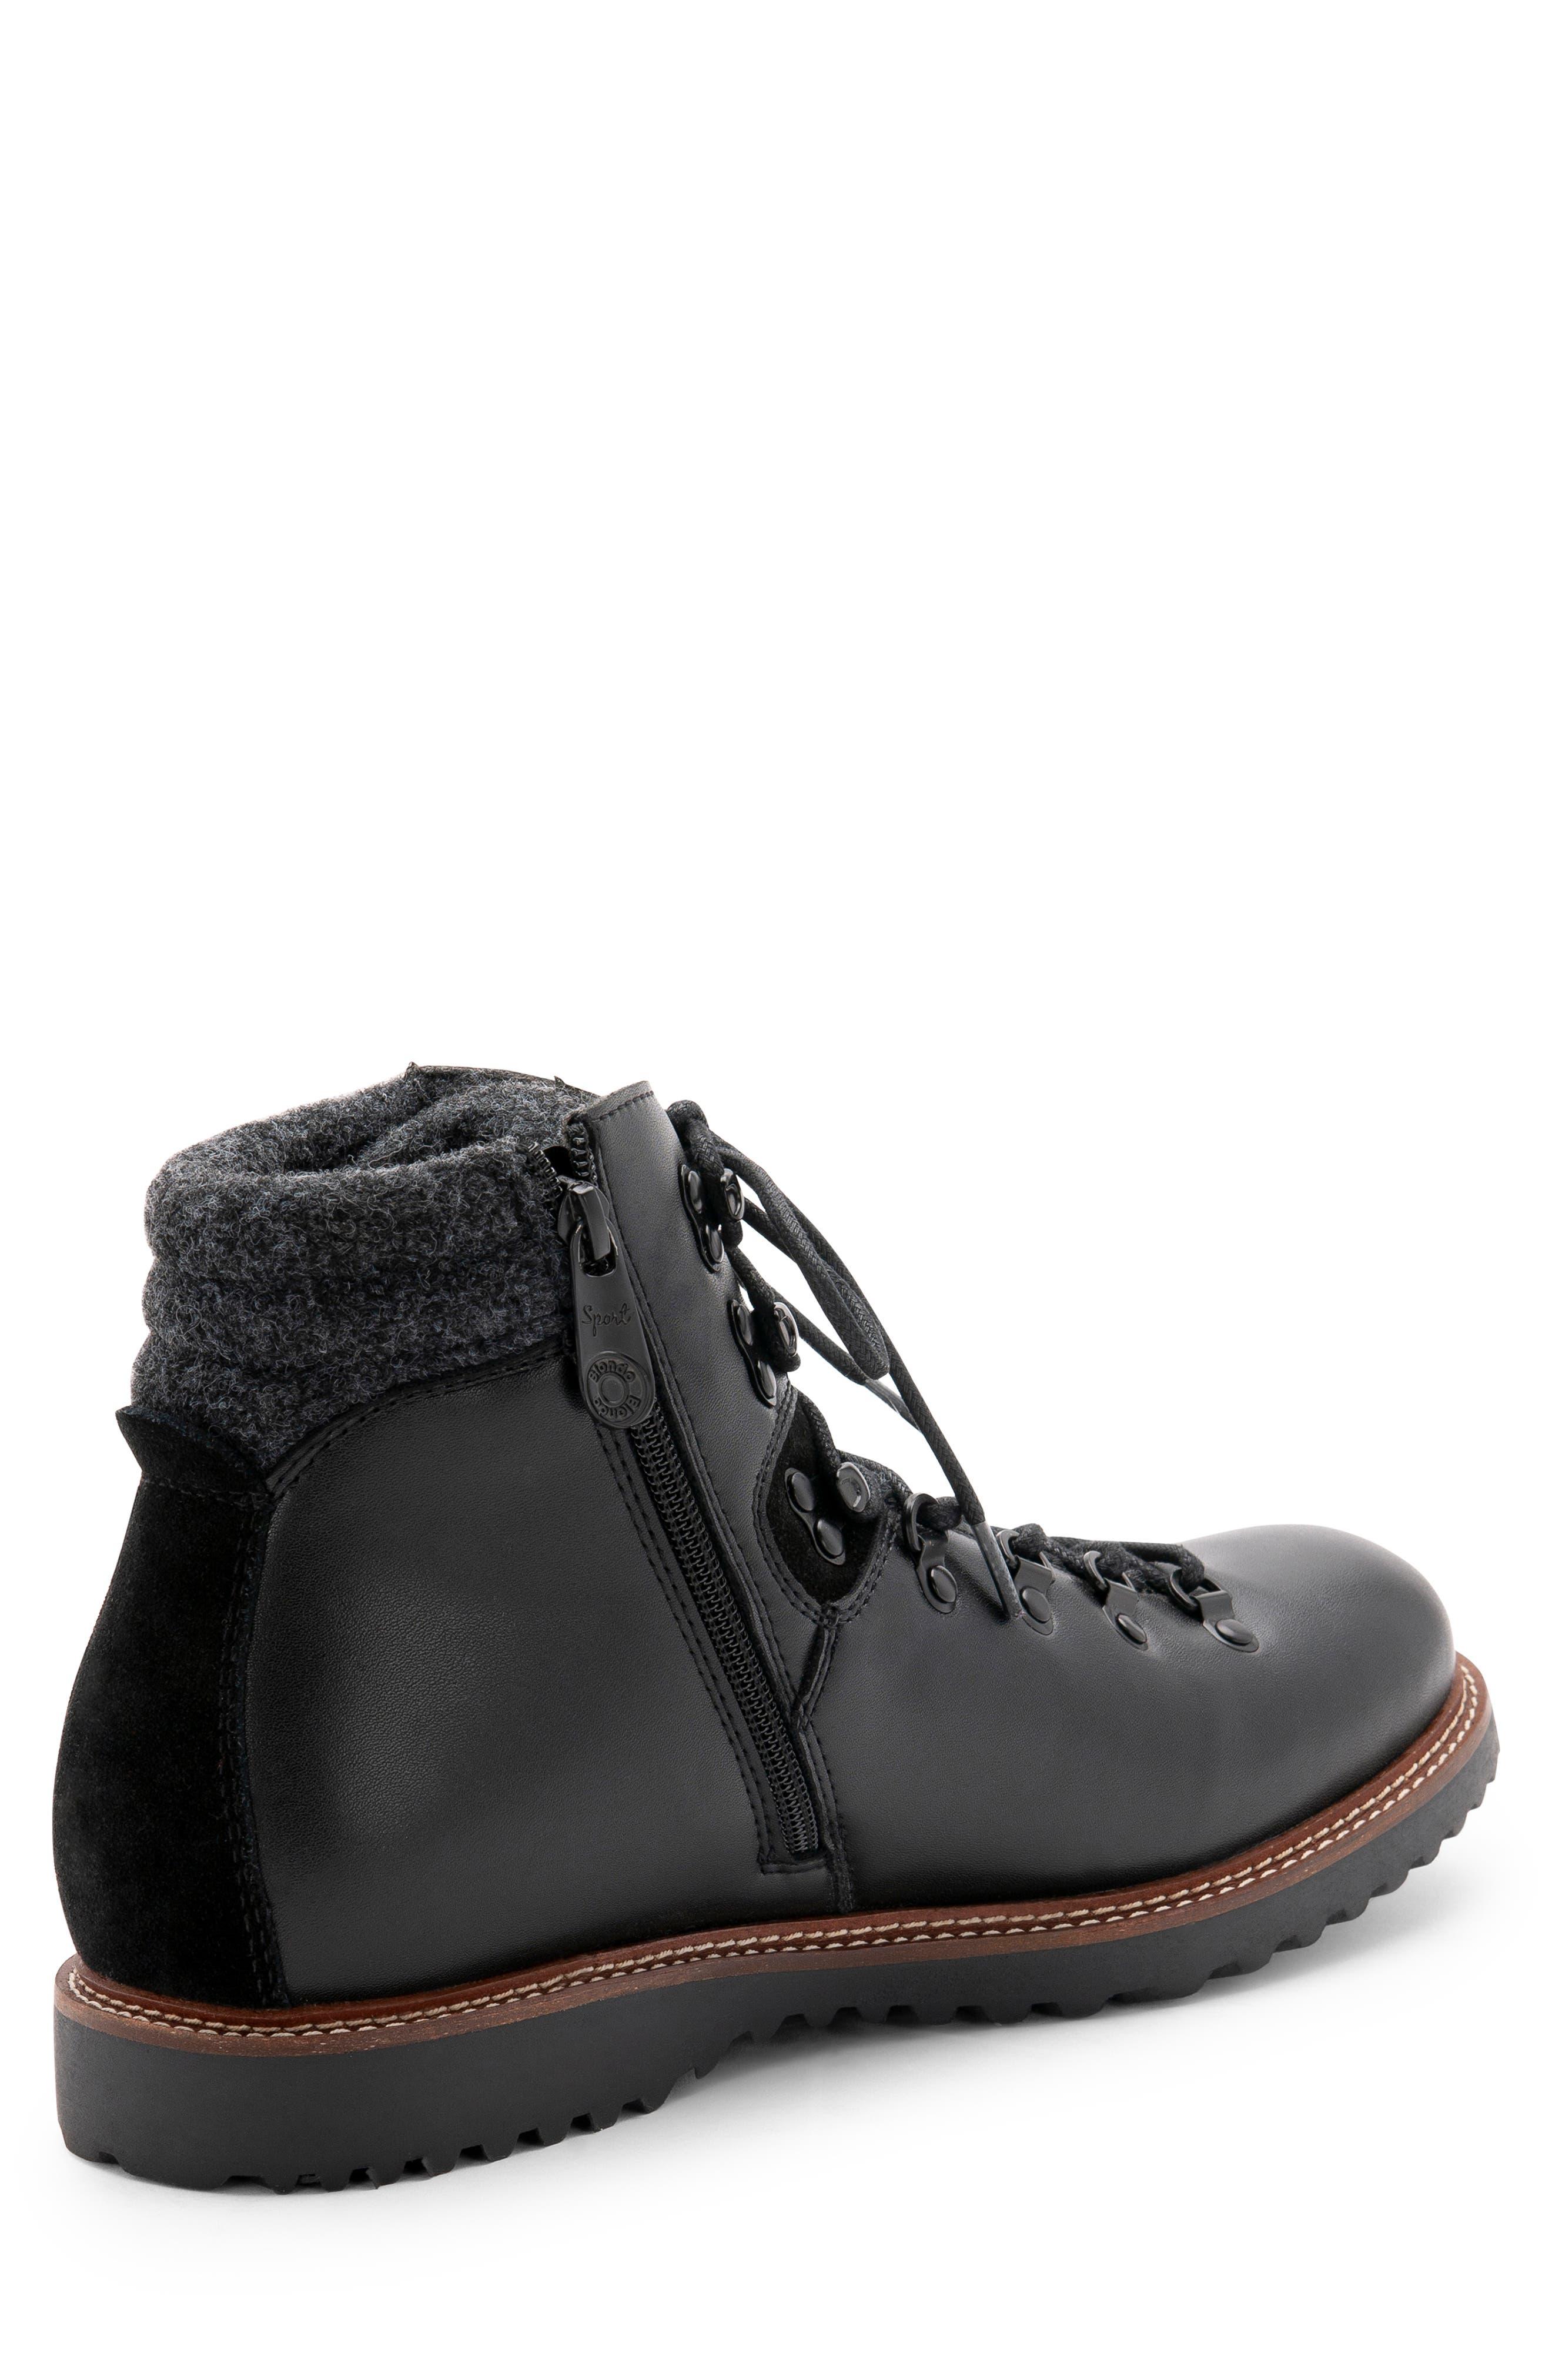 Morgan Waterproof Plain Toe Boot,                             Alternate thumbnail 7, color,                             BLACK LEATHER